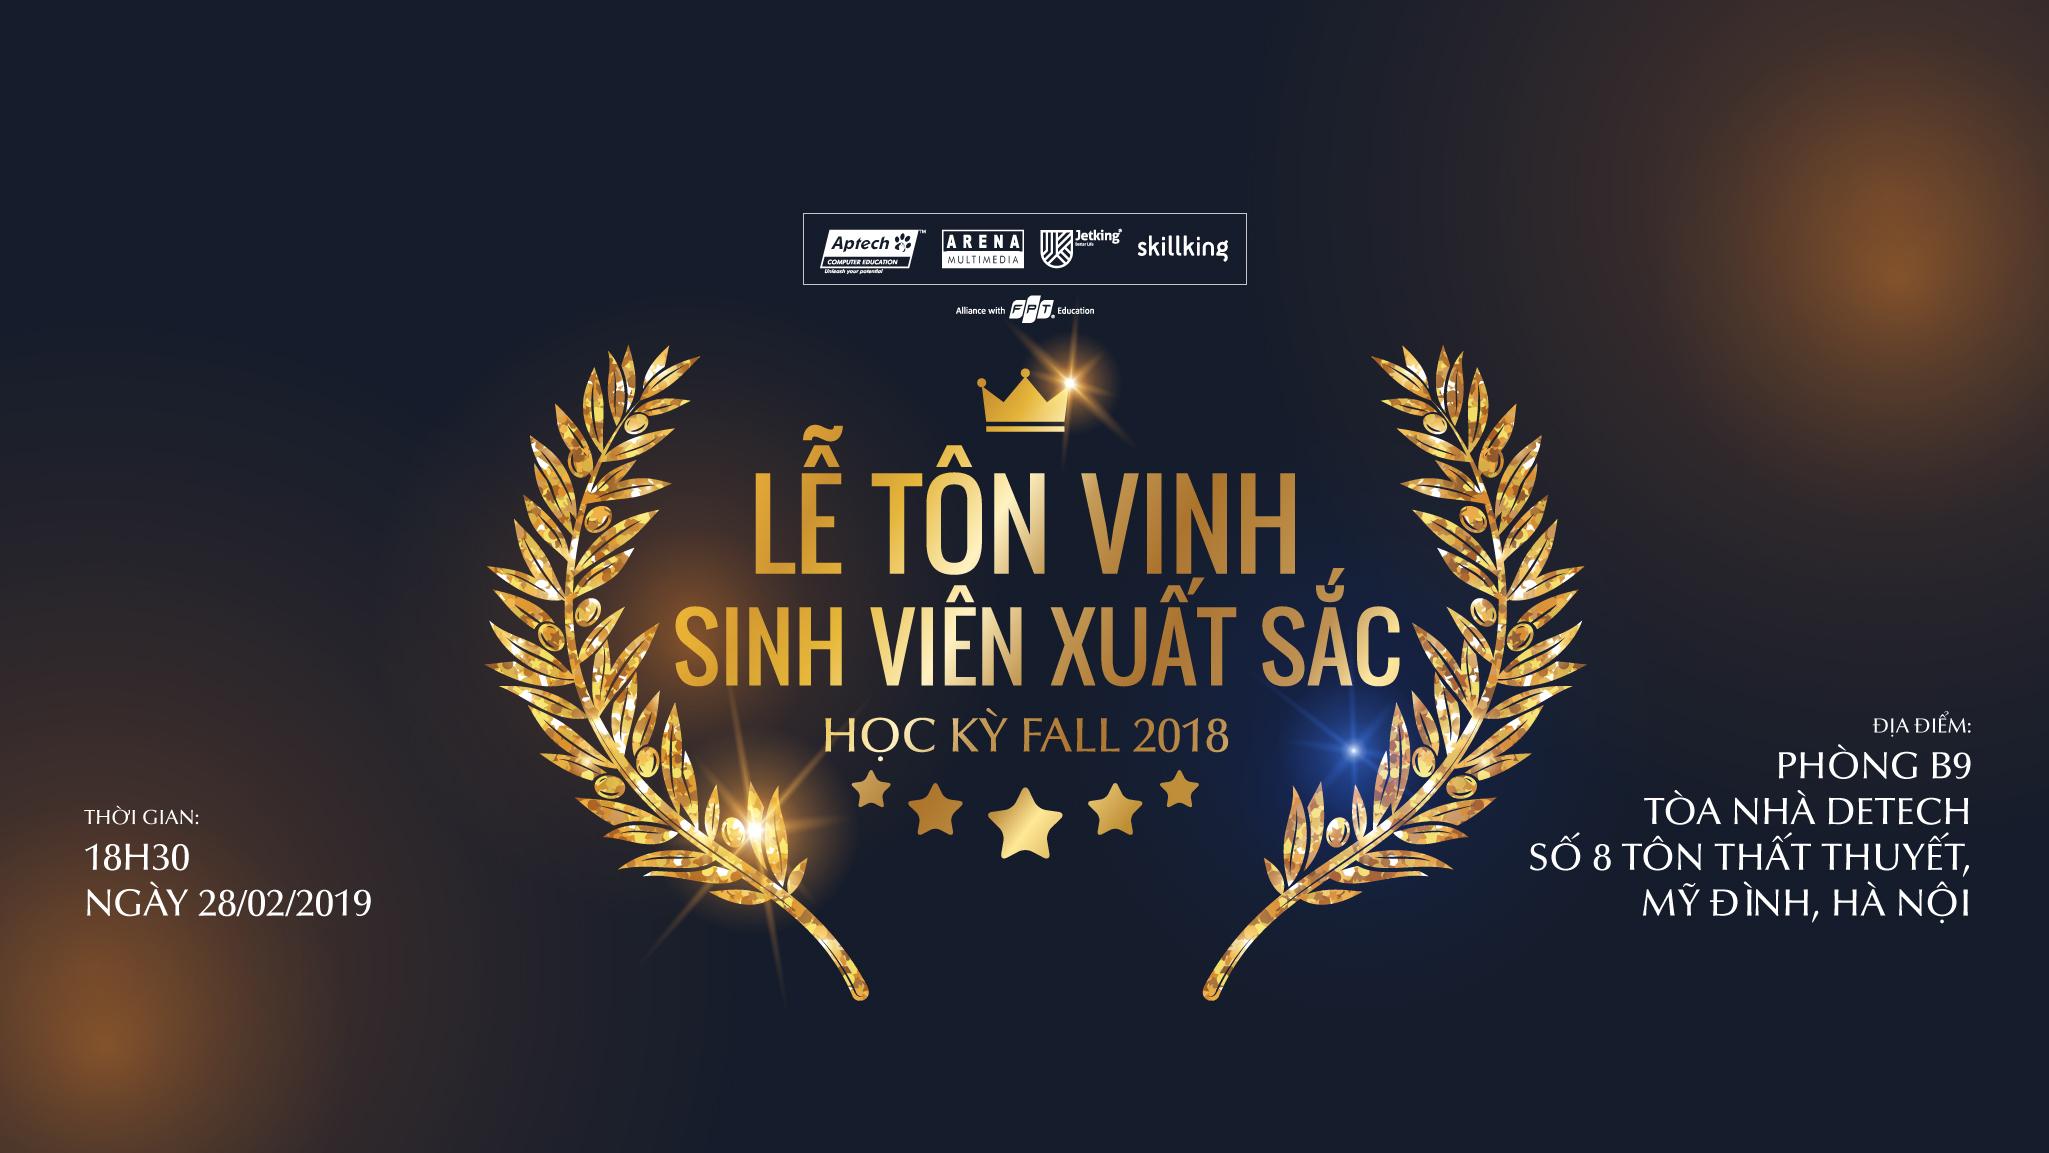 Le-ton-vinh-sinh-vien-xuat-sac-hoc-ky-fall-2018